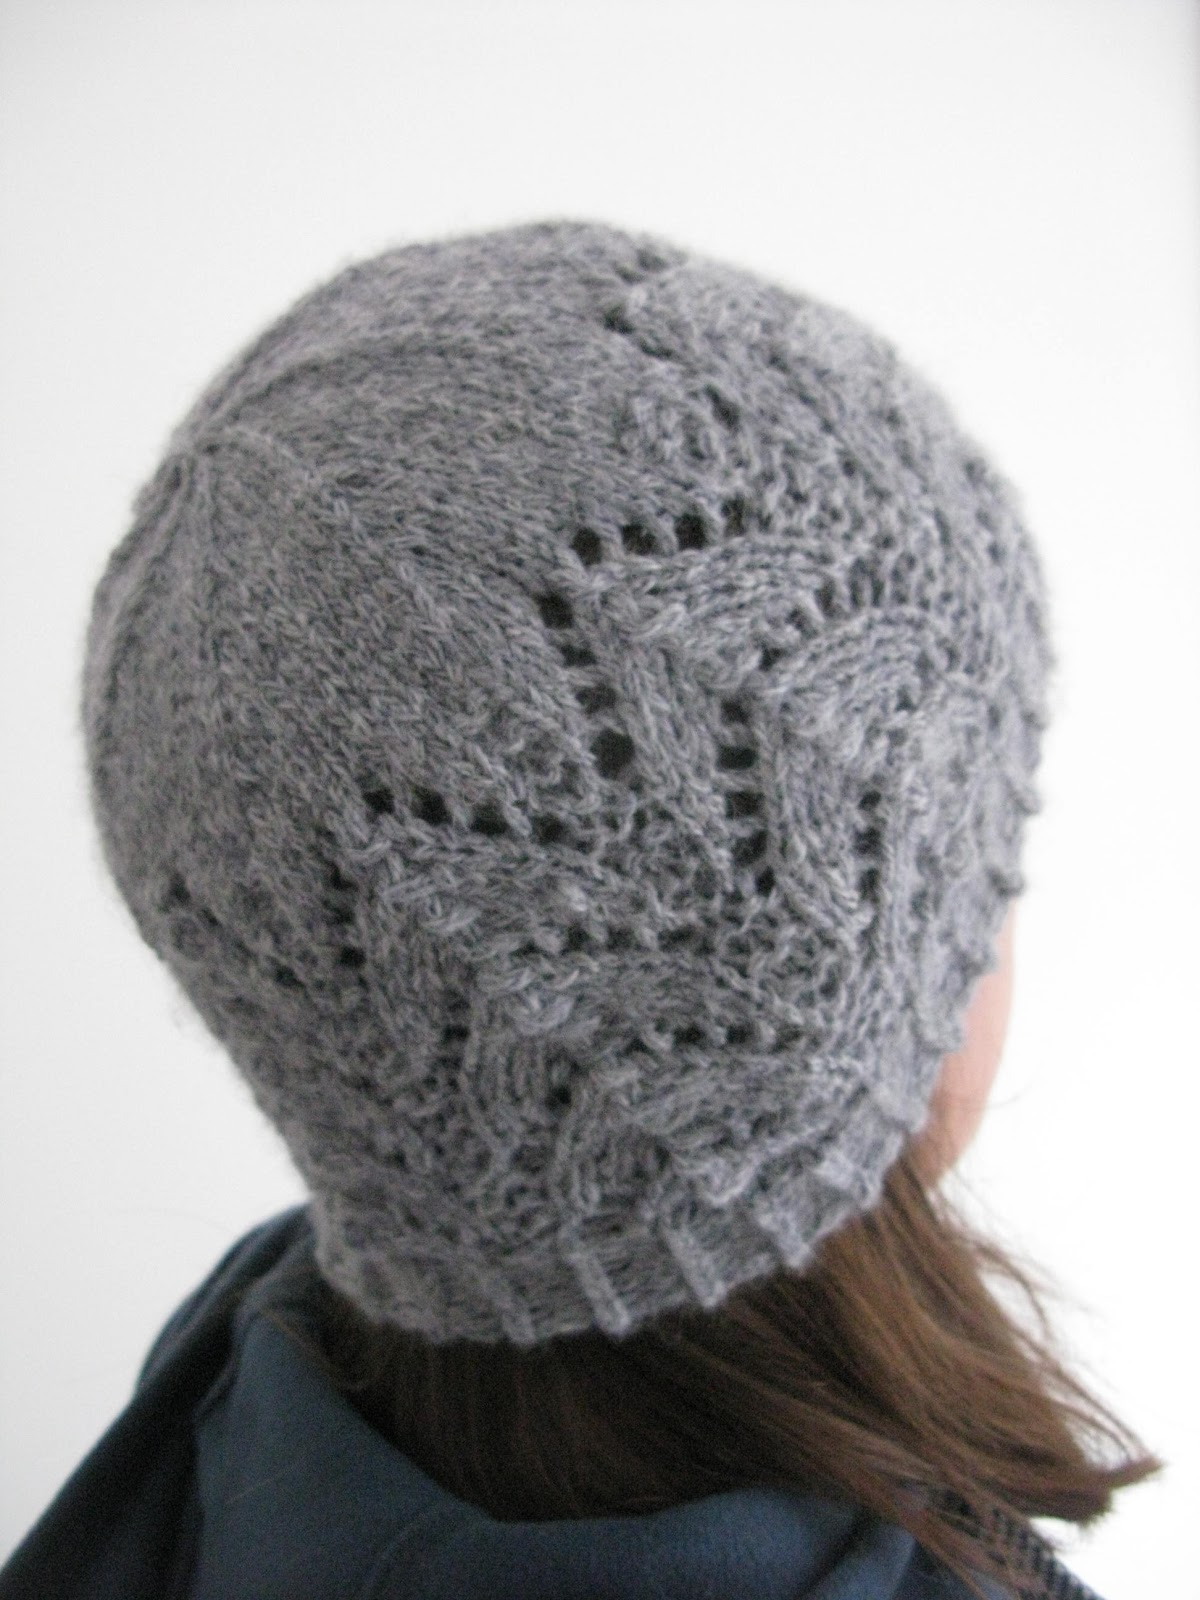 Cladach hat free knitting pattern by Littletheorem. Lace knitting chunky  alpaca 0a7f056aa27